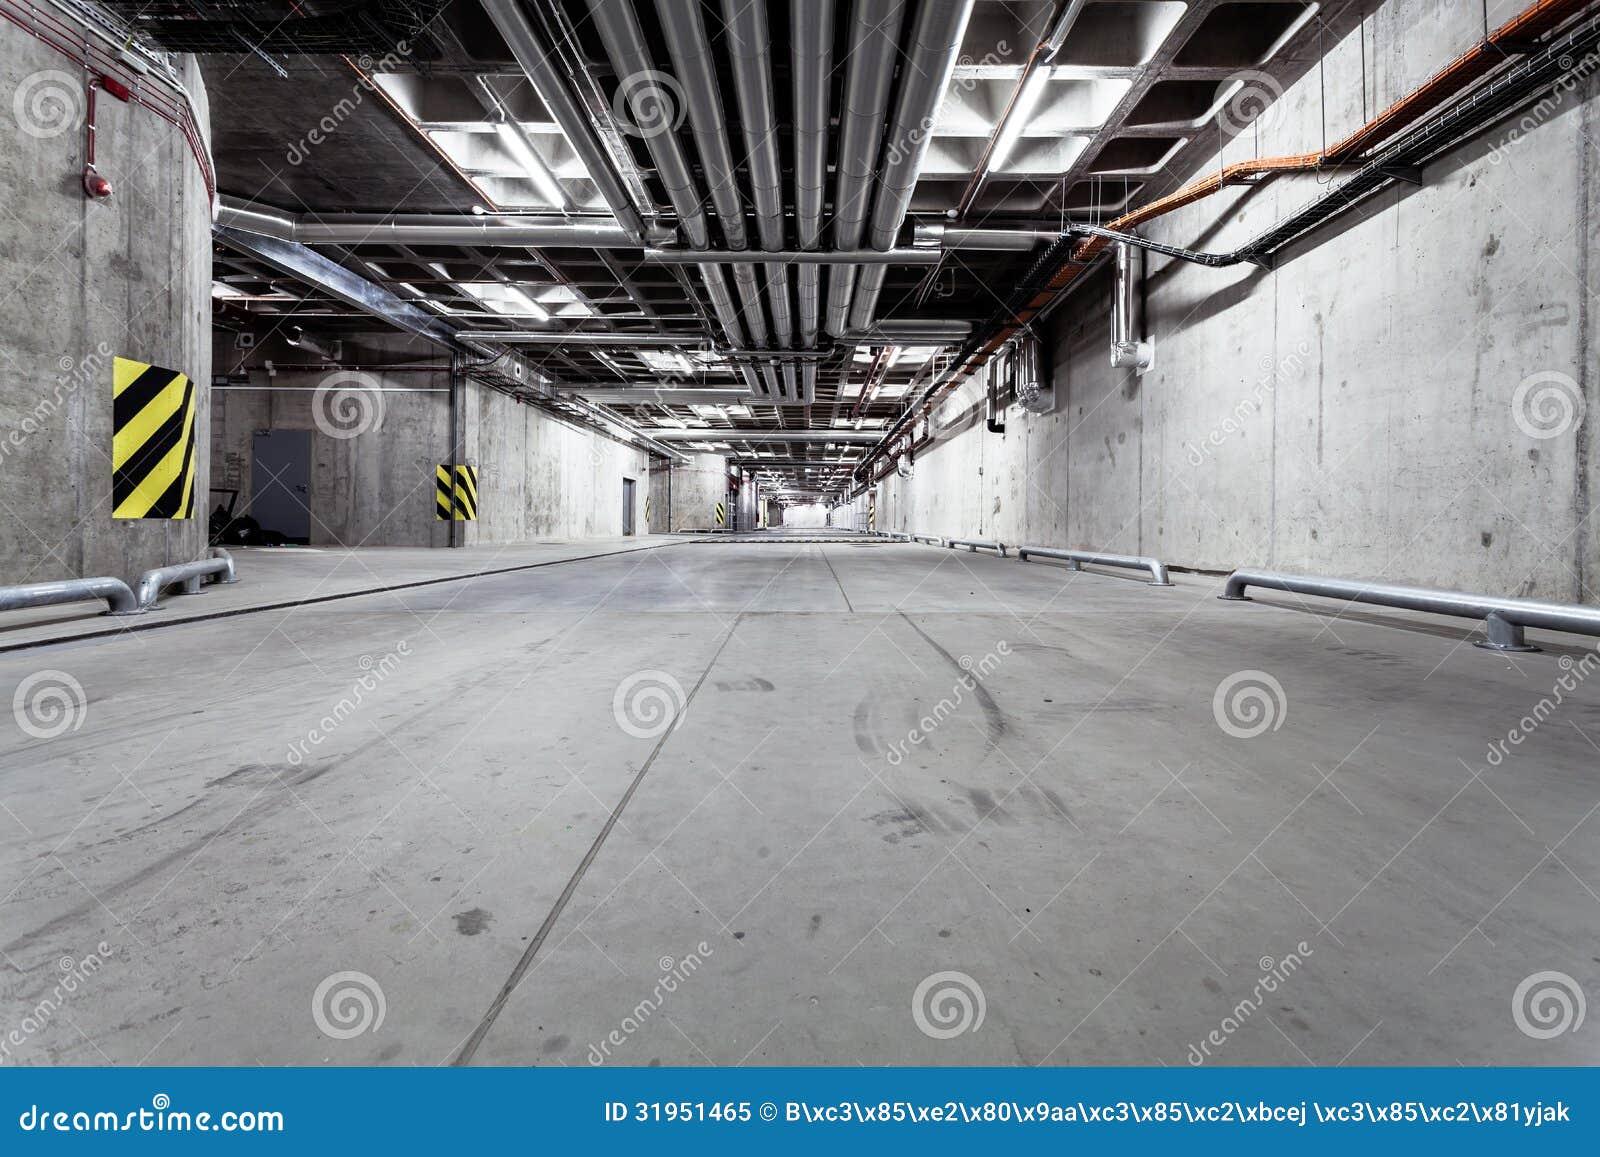 Underground Tunnel Road Construction Stock Image Image